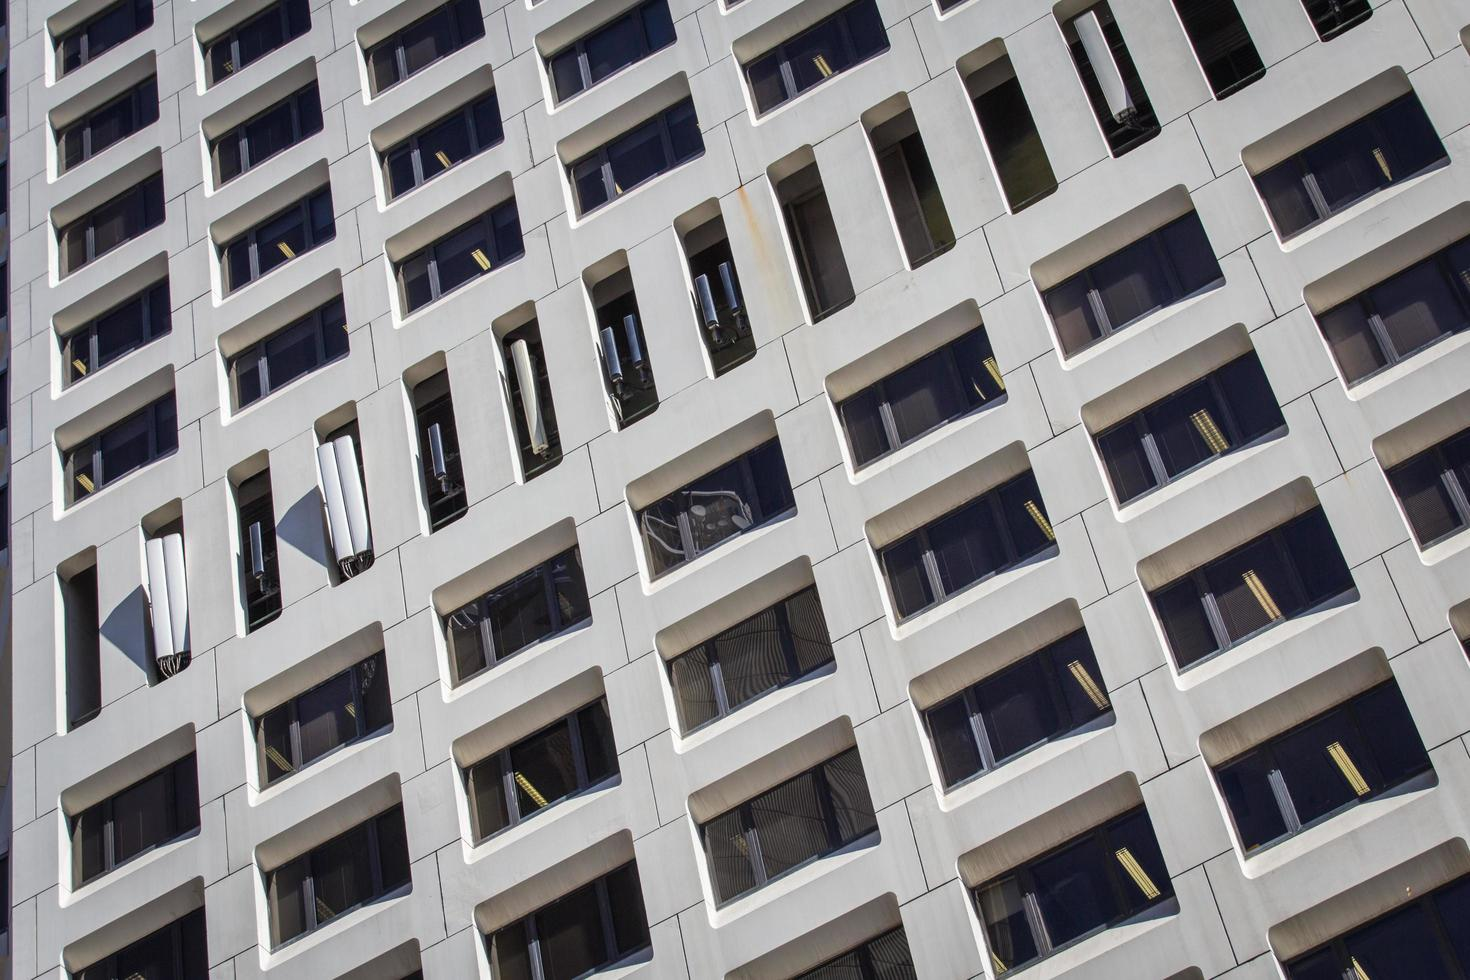 Sydney, Australia, 2020 - Low angle photo of gray concrete building